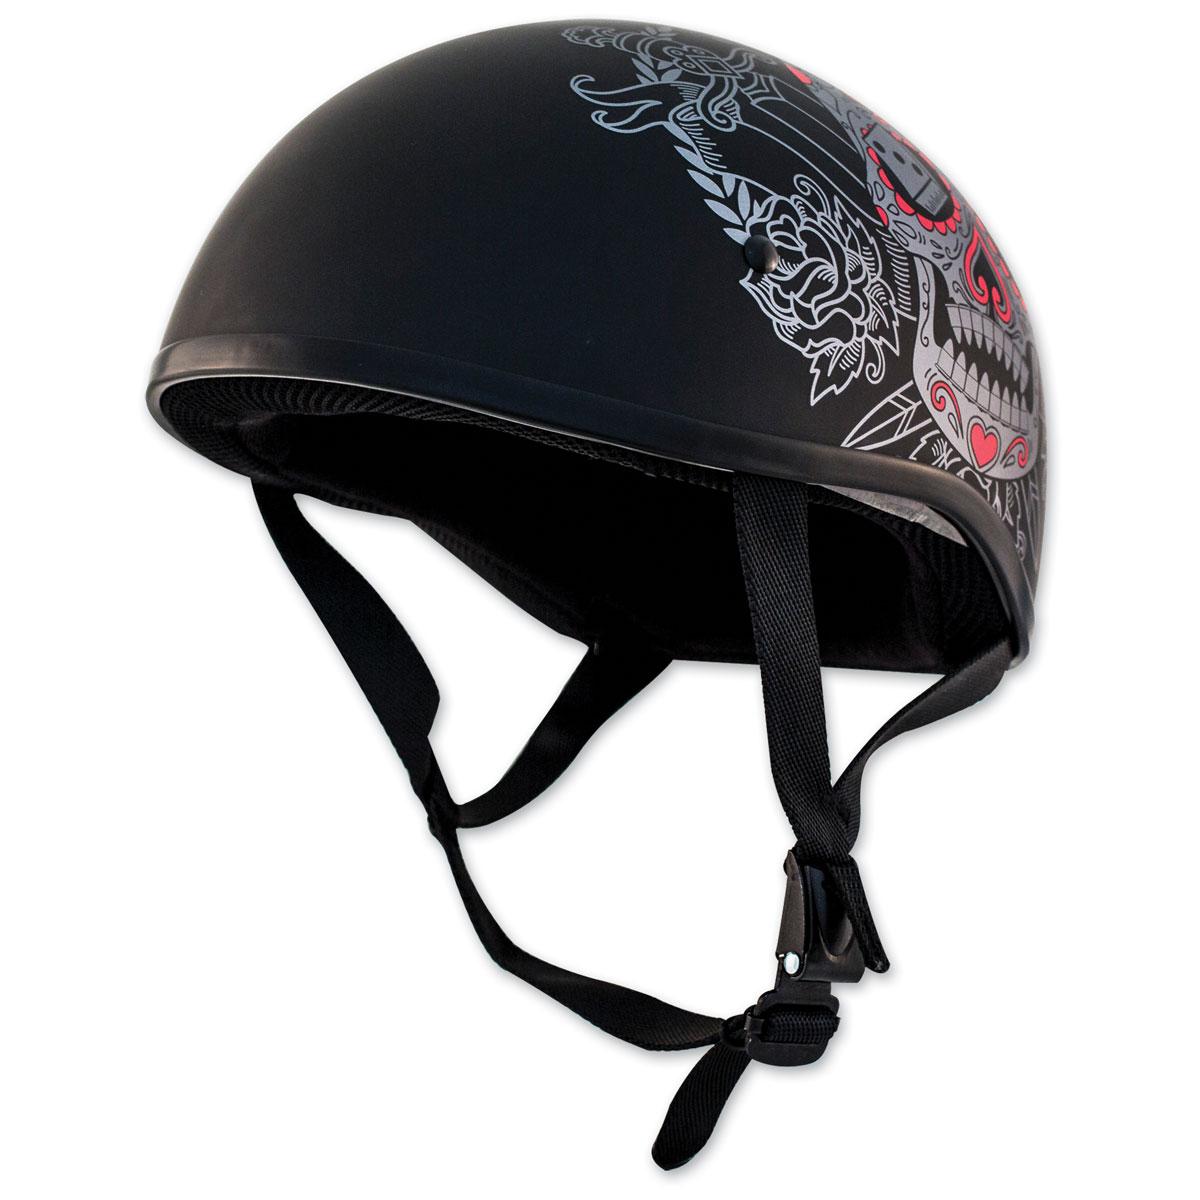 ZOX Helmet | eBay